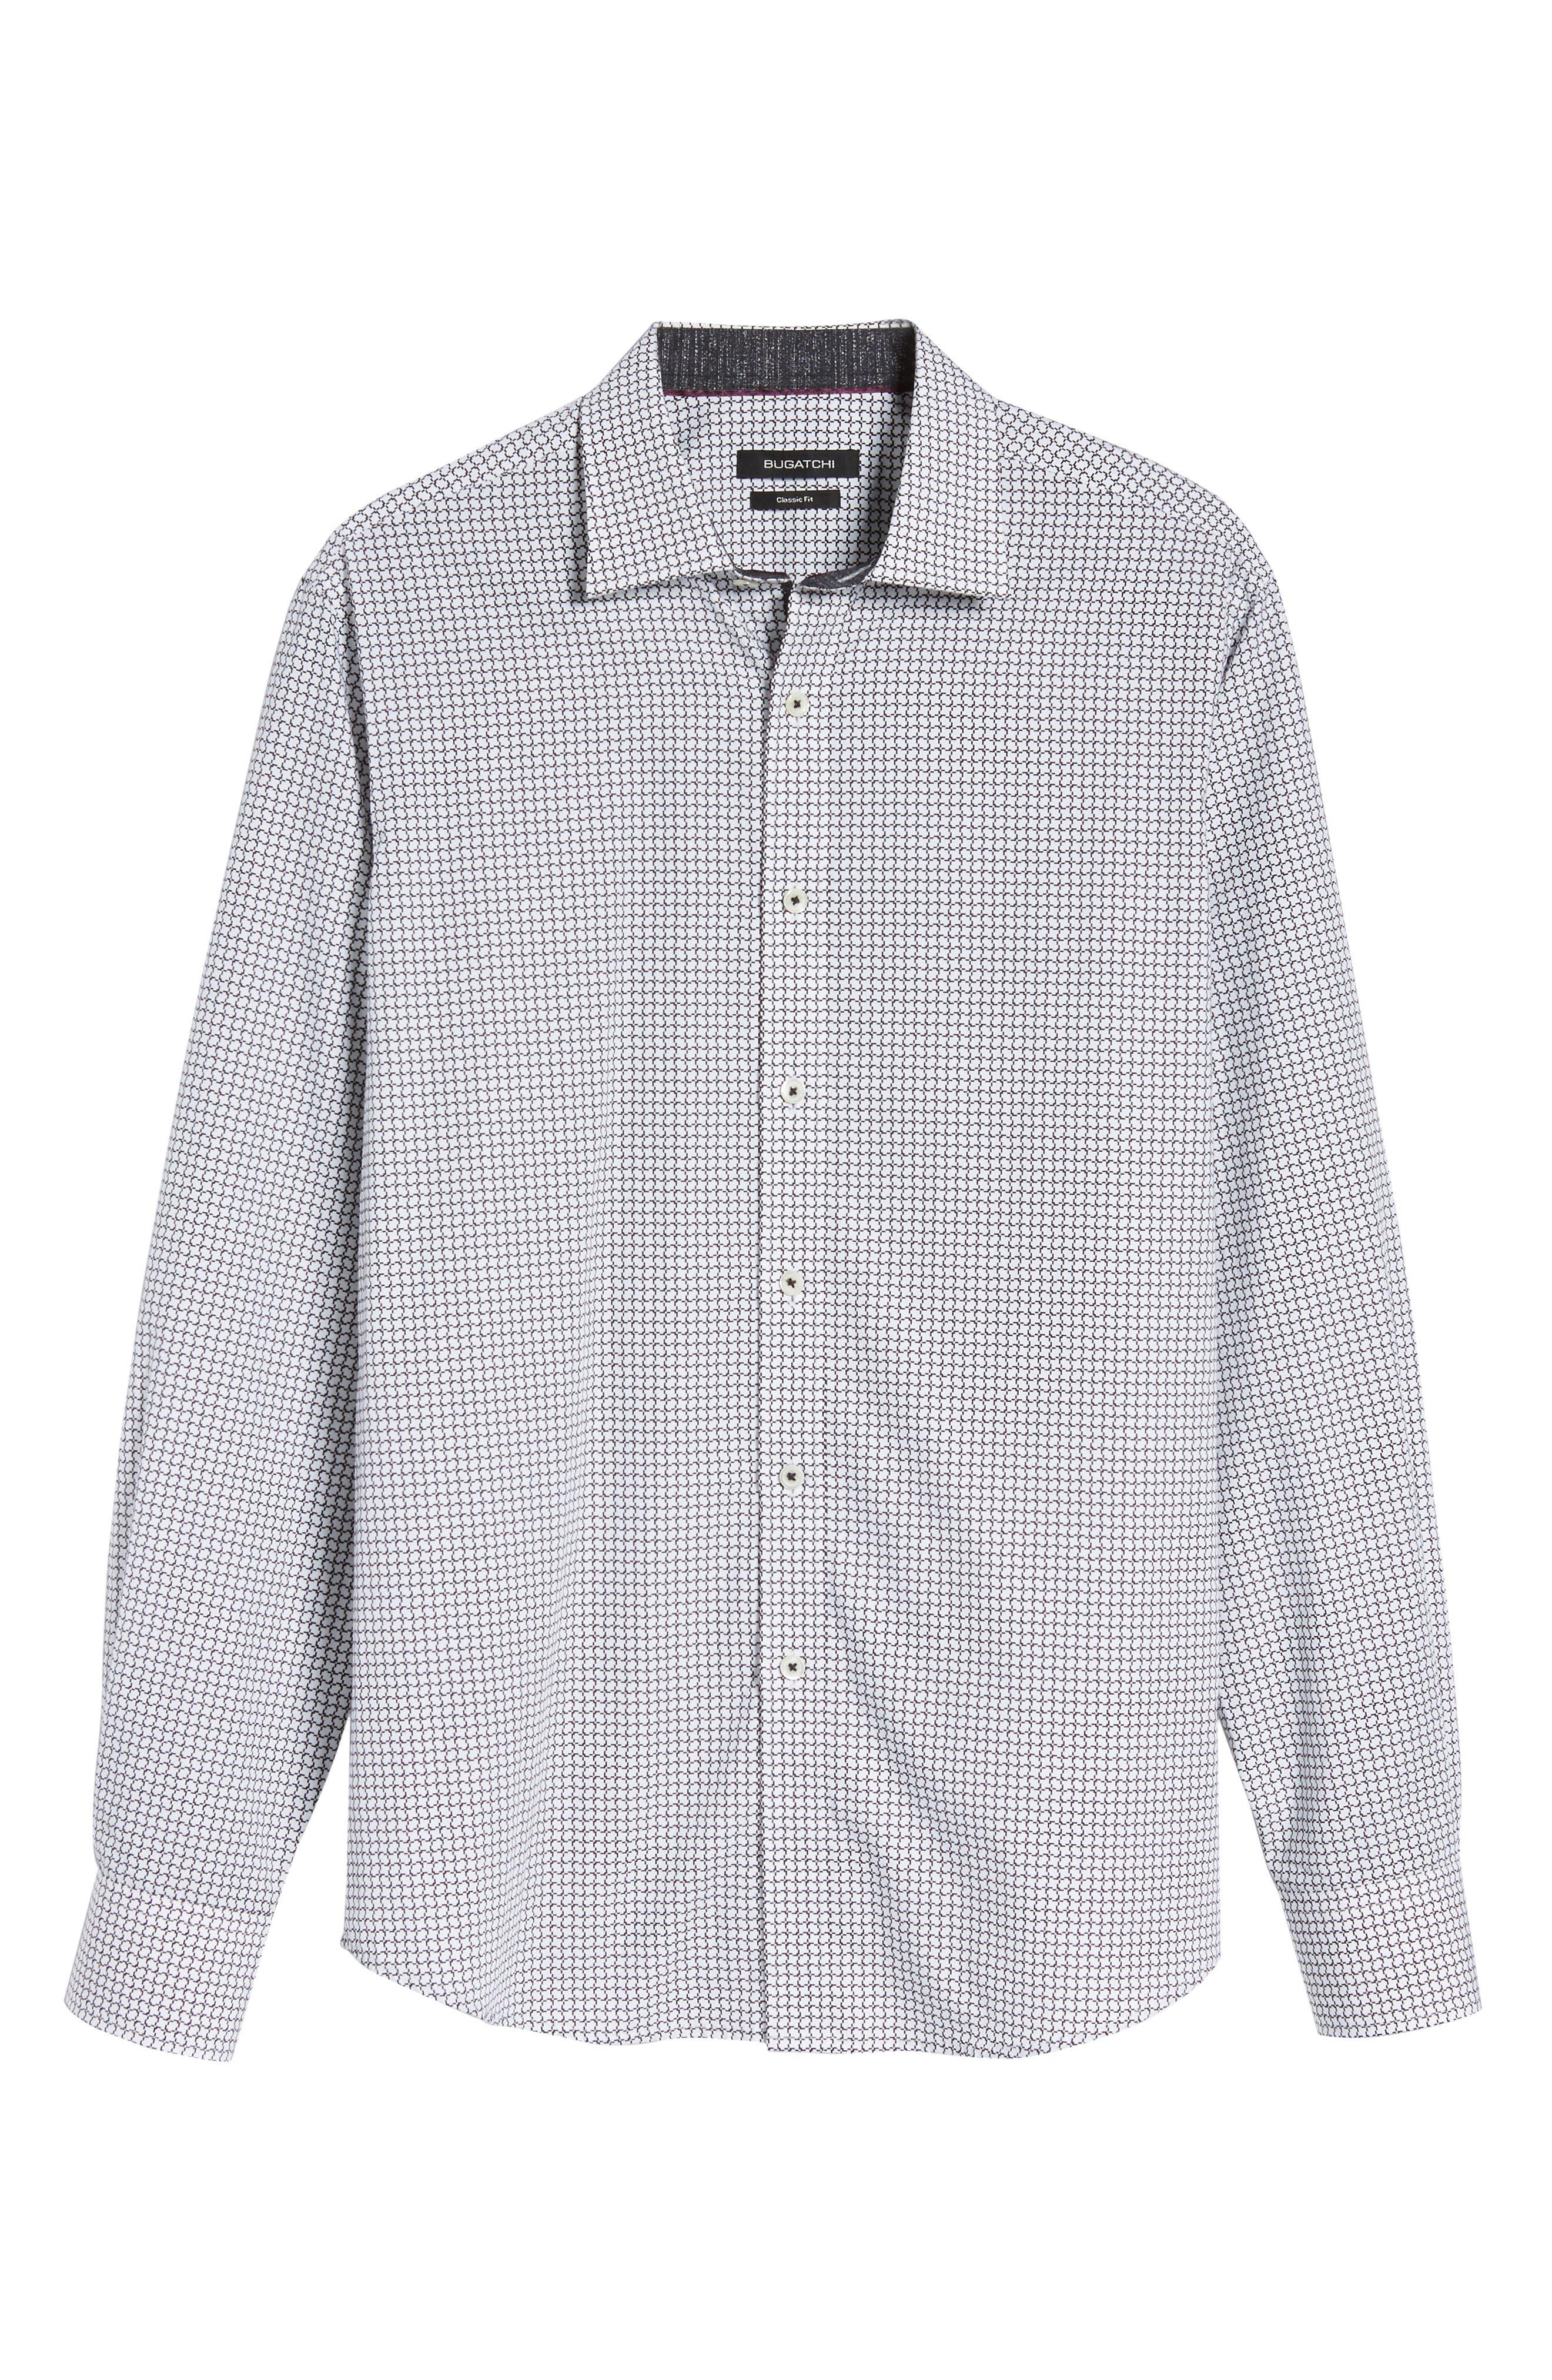 Classic Fit Print Sport Shirt,                             Alternate thumbnail 6, color,                             White